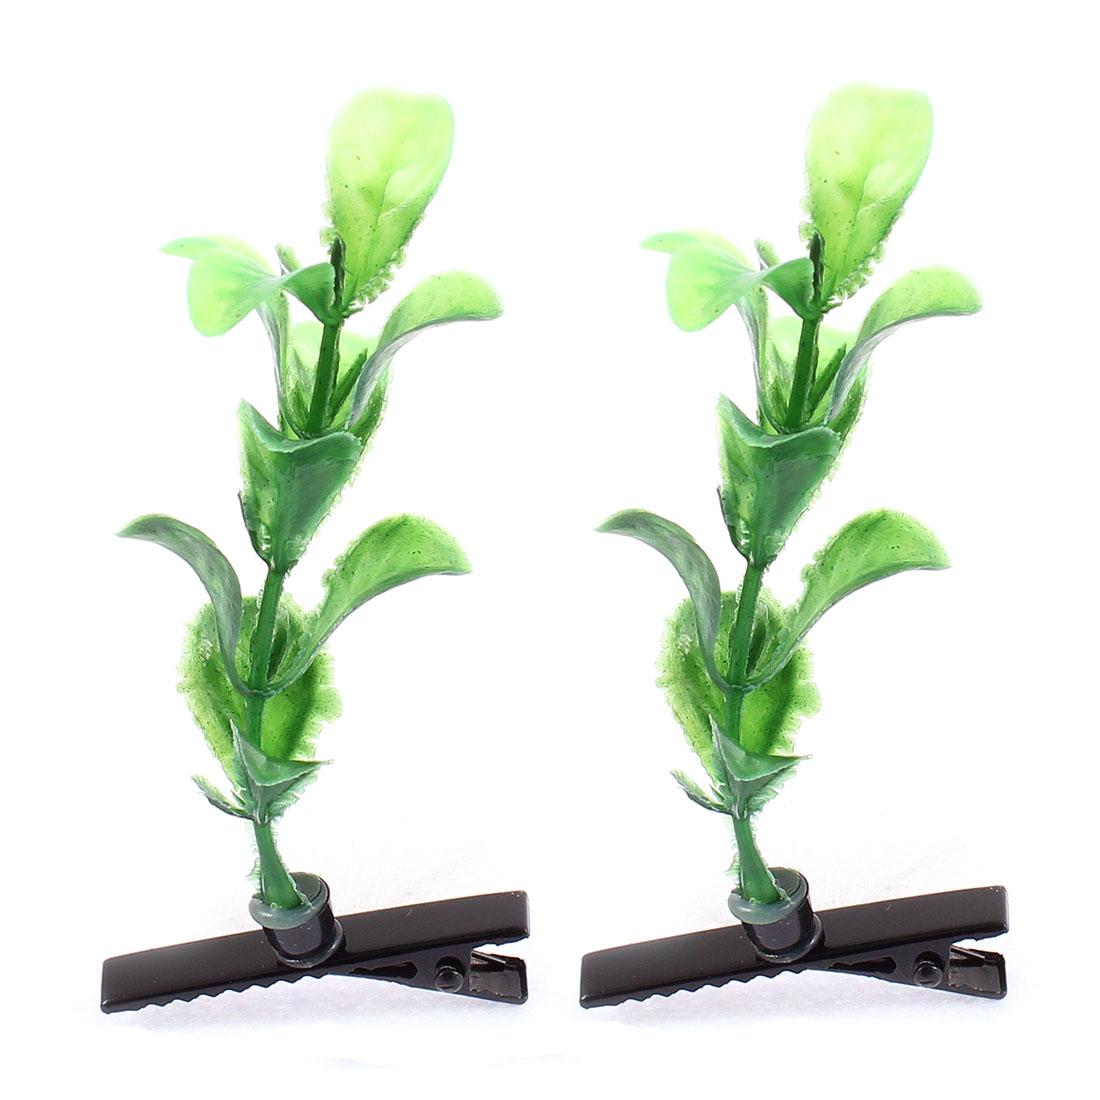 Lady Woman Plastic Plant Decor Party Alligator Hair Clip Barrette Green Pair